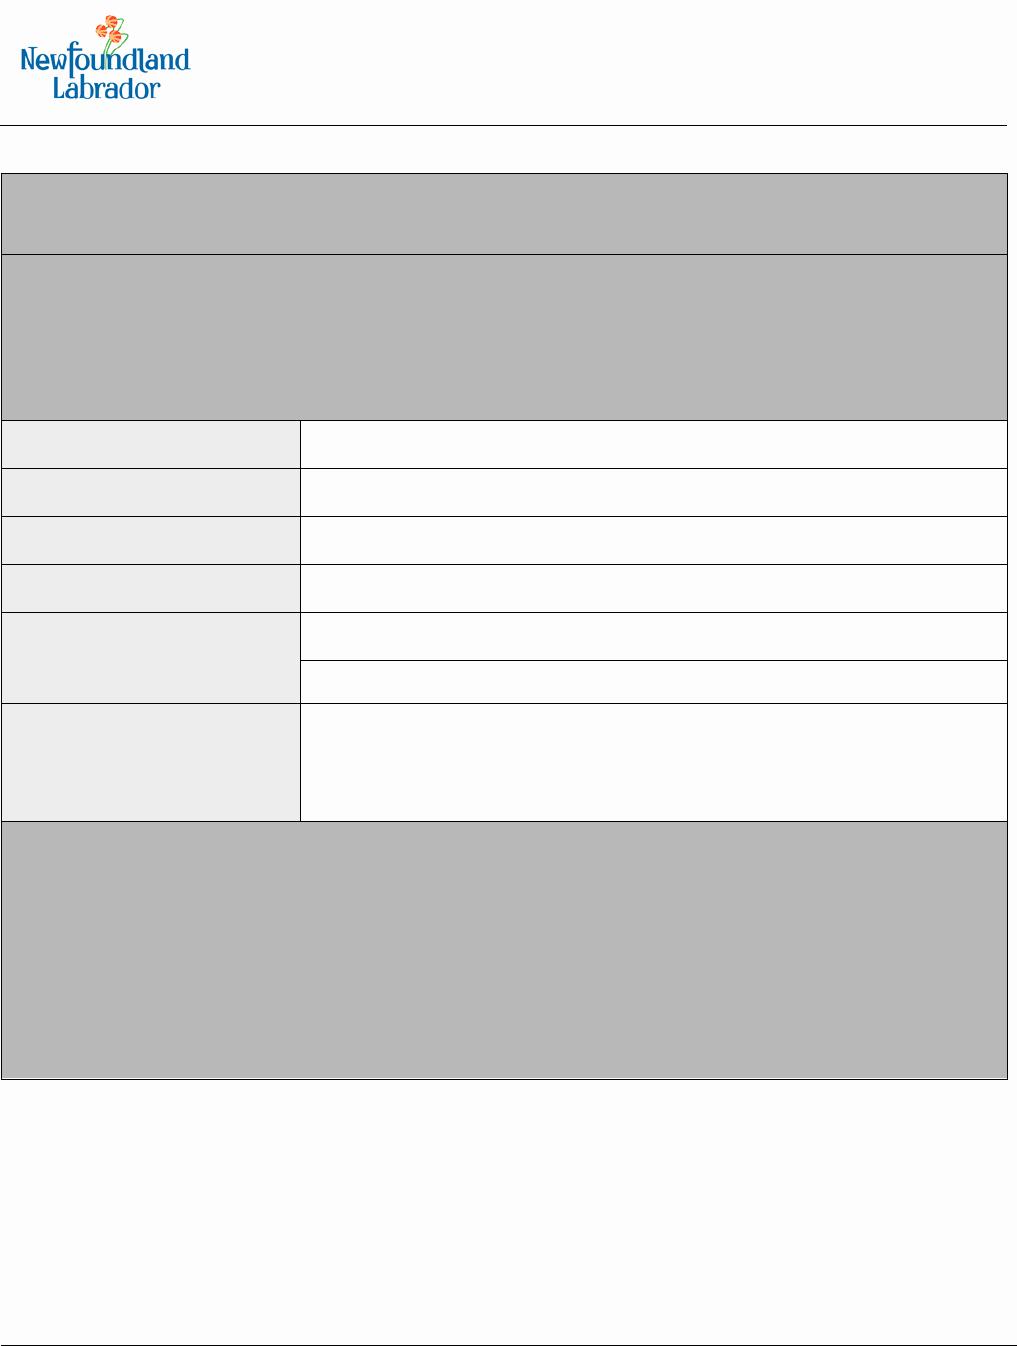 Procedure Manual Template Word Free Luxury Download Procedure Manual Template Word for Free